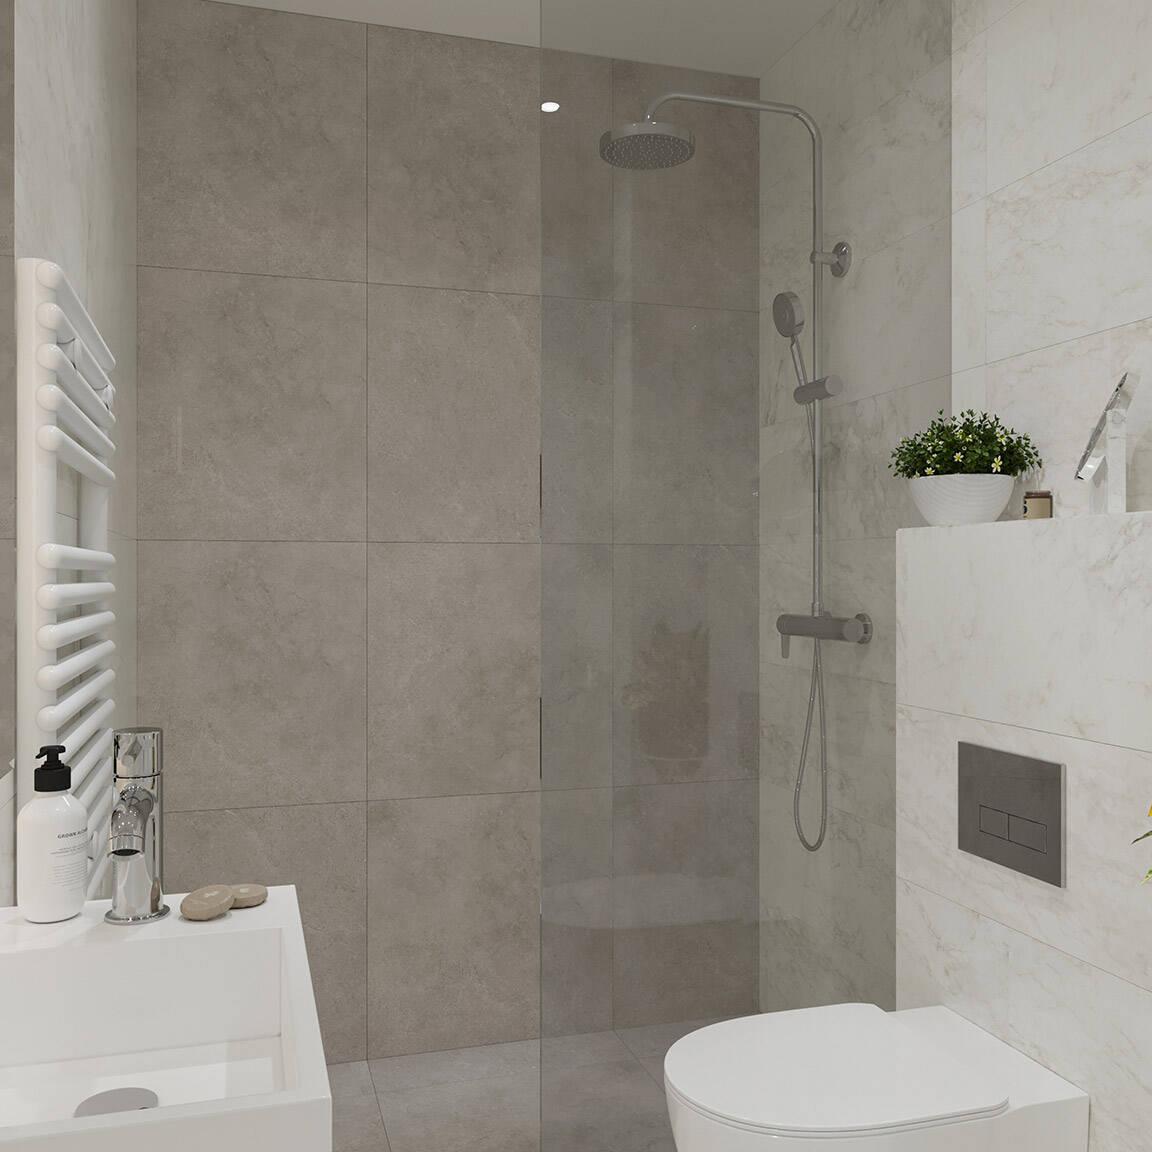 Catedral Residence - Bathroom - Marazzi Ceramic tiles - 11